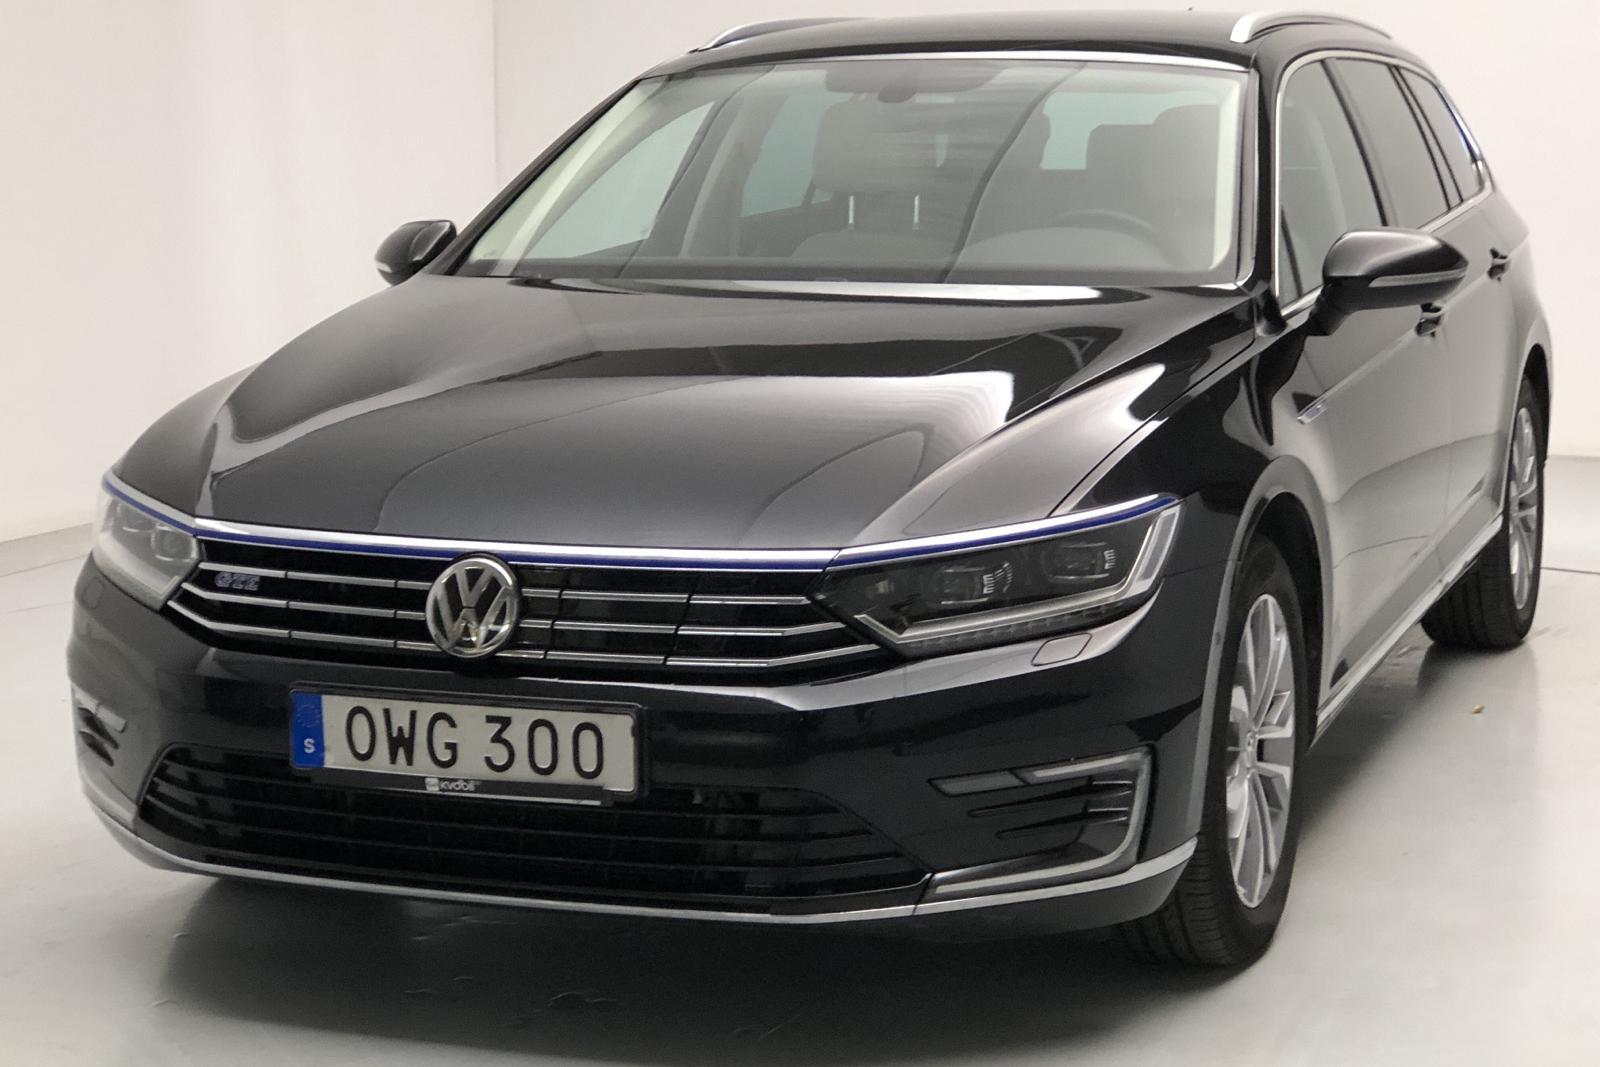 VW Passat 1.4 Plug-in-Hybrid Sportscombi (218hk) - 4 598 mil - Automat - svart - 2018